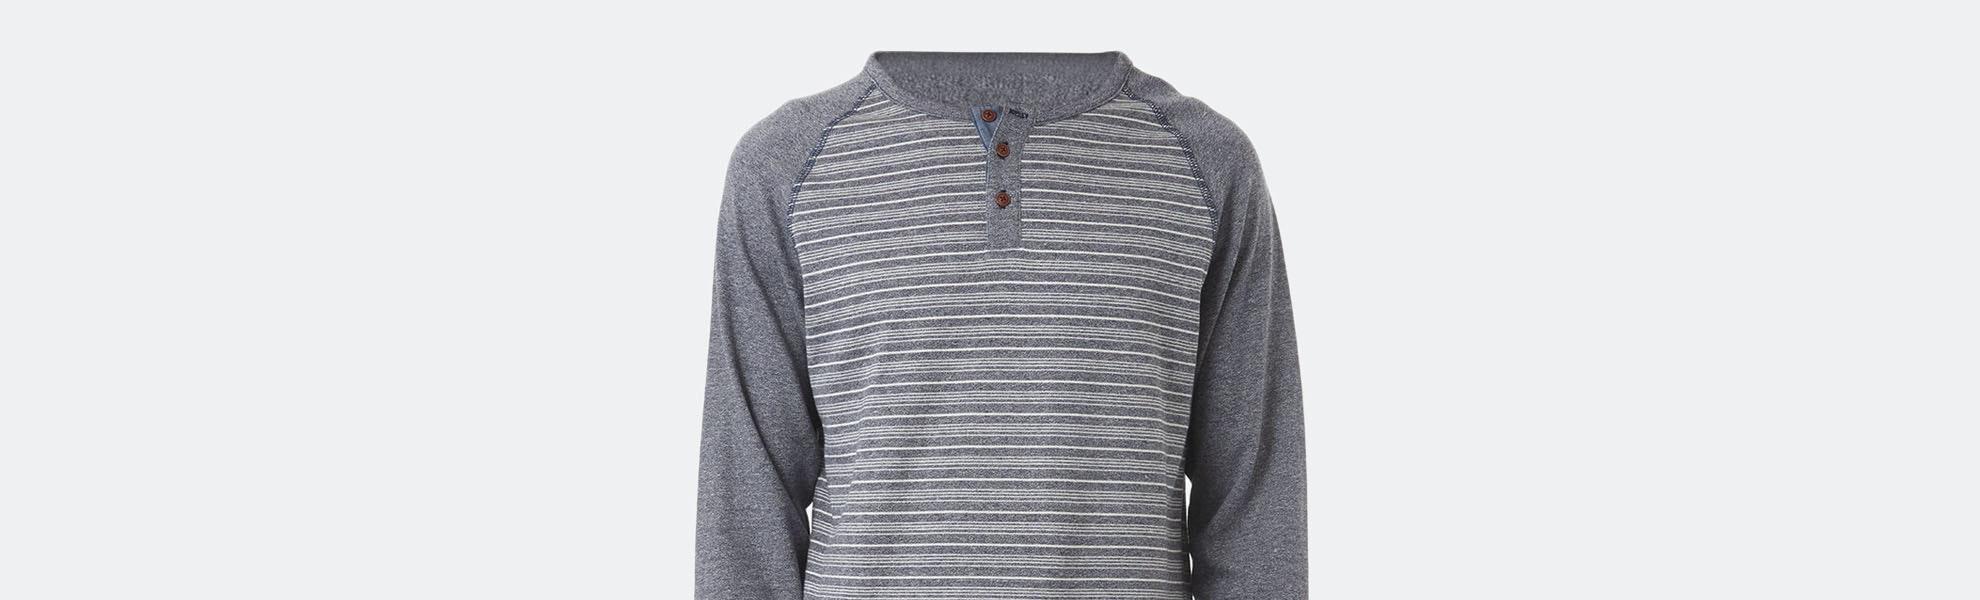 PX Clothing Jimmy Raglan Curved-Hem Henley